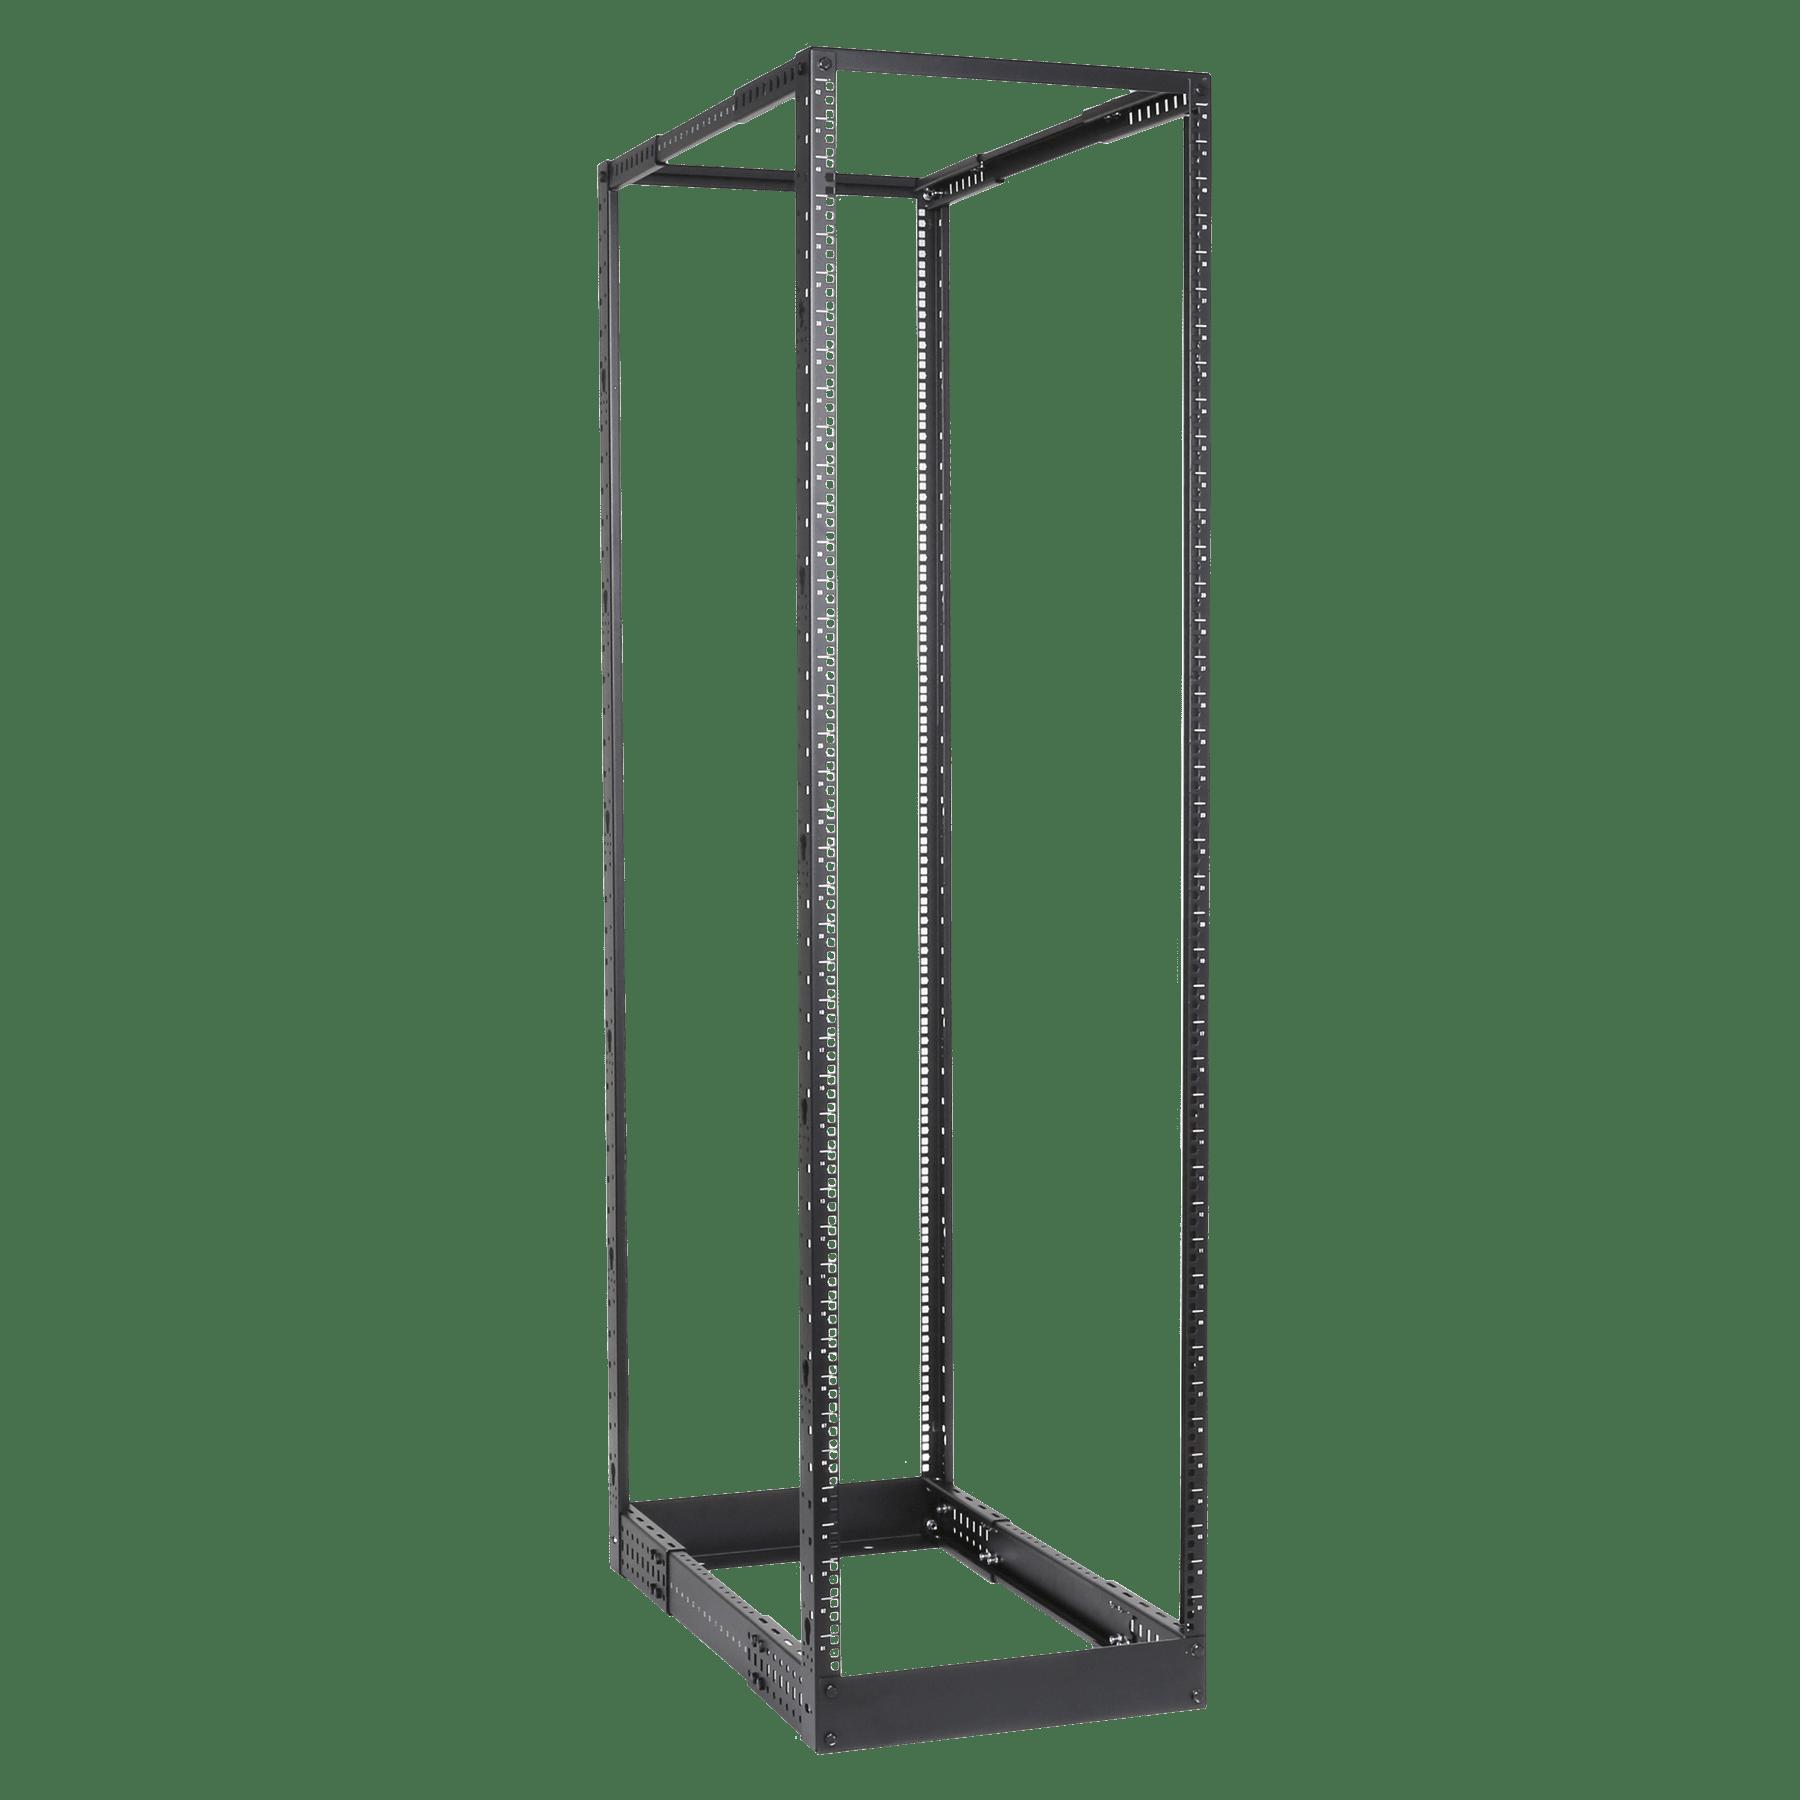 "DPR942 - 4-post 19"" open-frame rack - 42 units - 550~1015 mm depth"